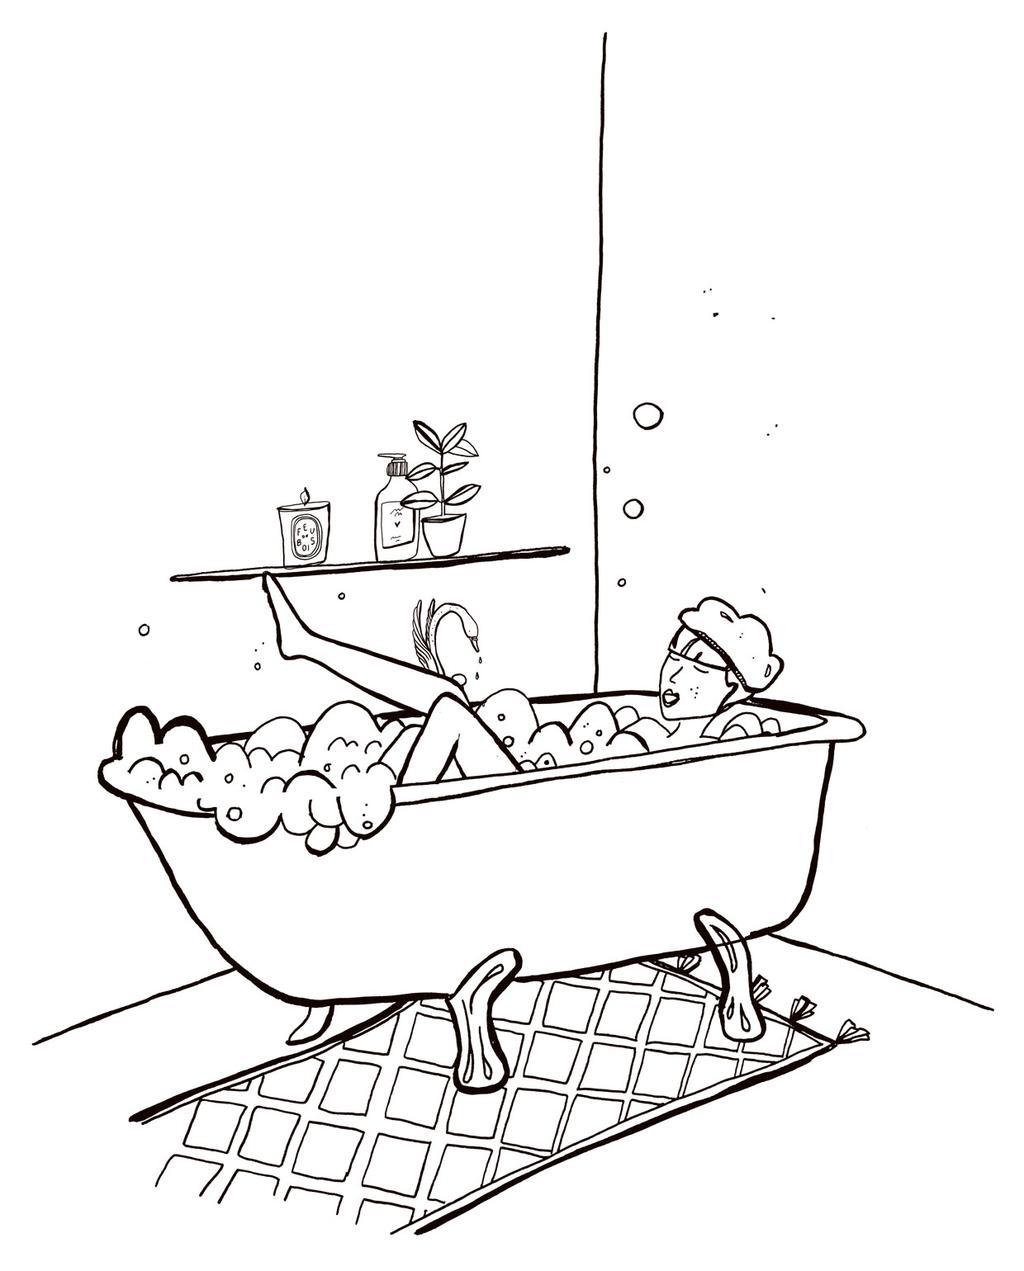 vtwonen-illustratie-badkamer-douche-bad-make-over-budget-dossier